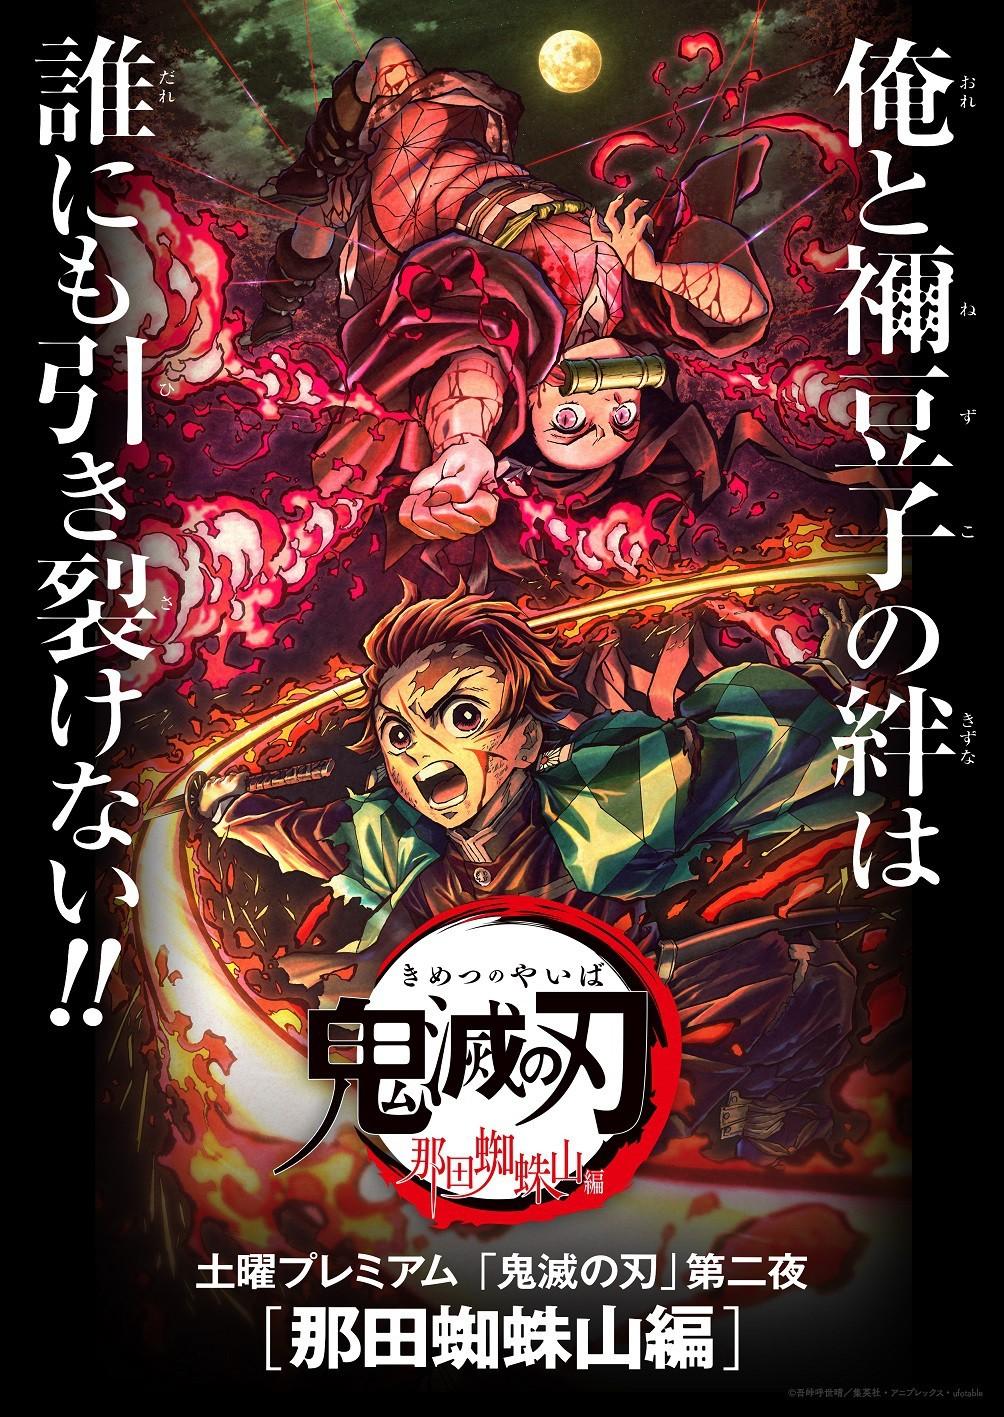 Thanh Gươm Diệt Quỷ: Núi Nhện Nada - Demon Slayer: Kimetsu no Yaiba - Nada Spider Mountain